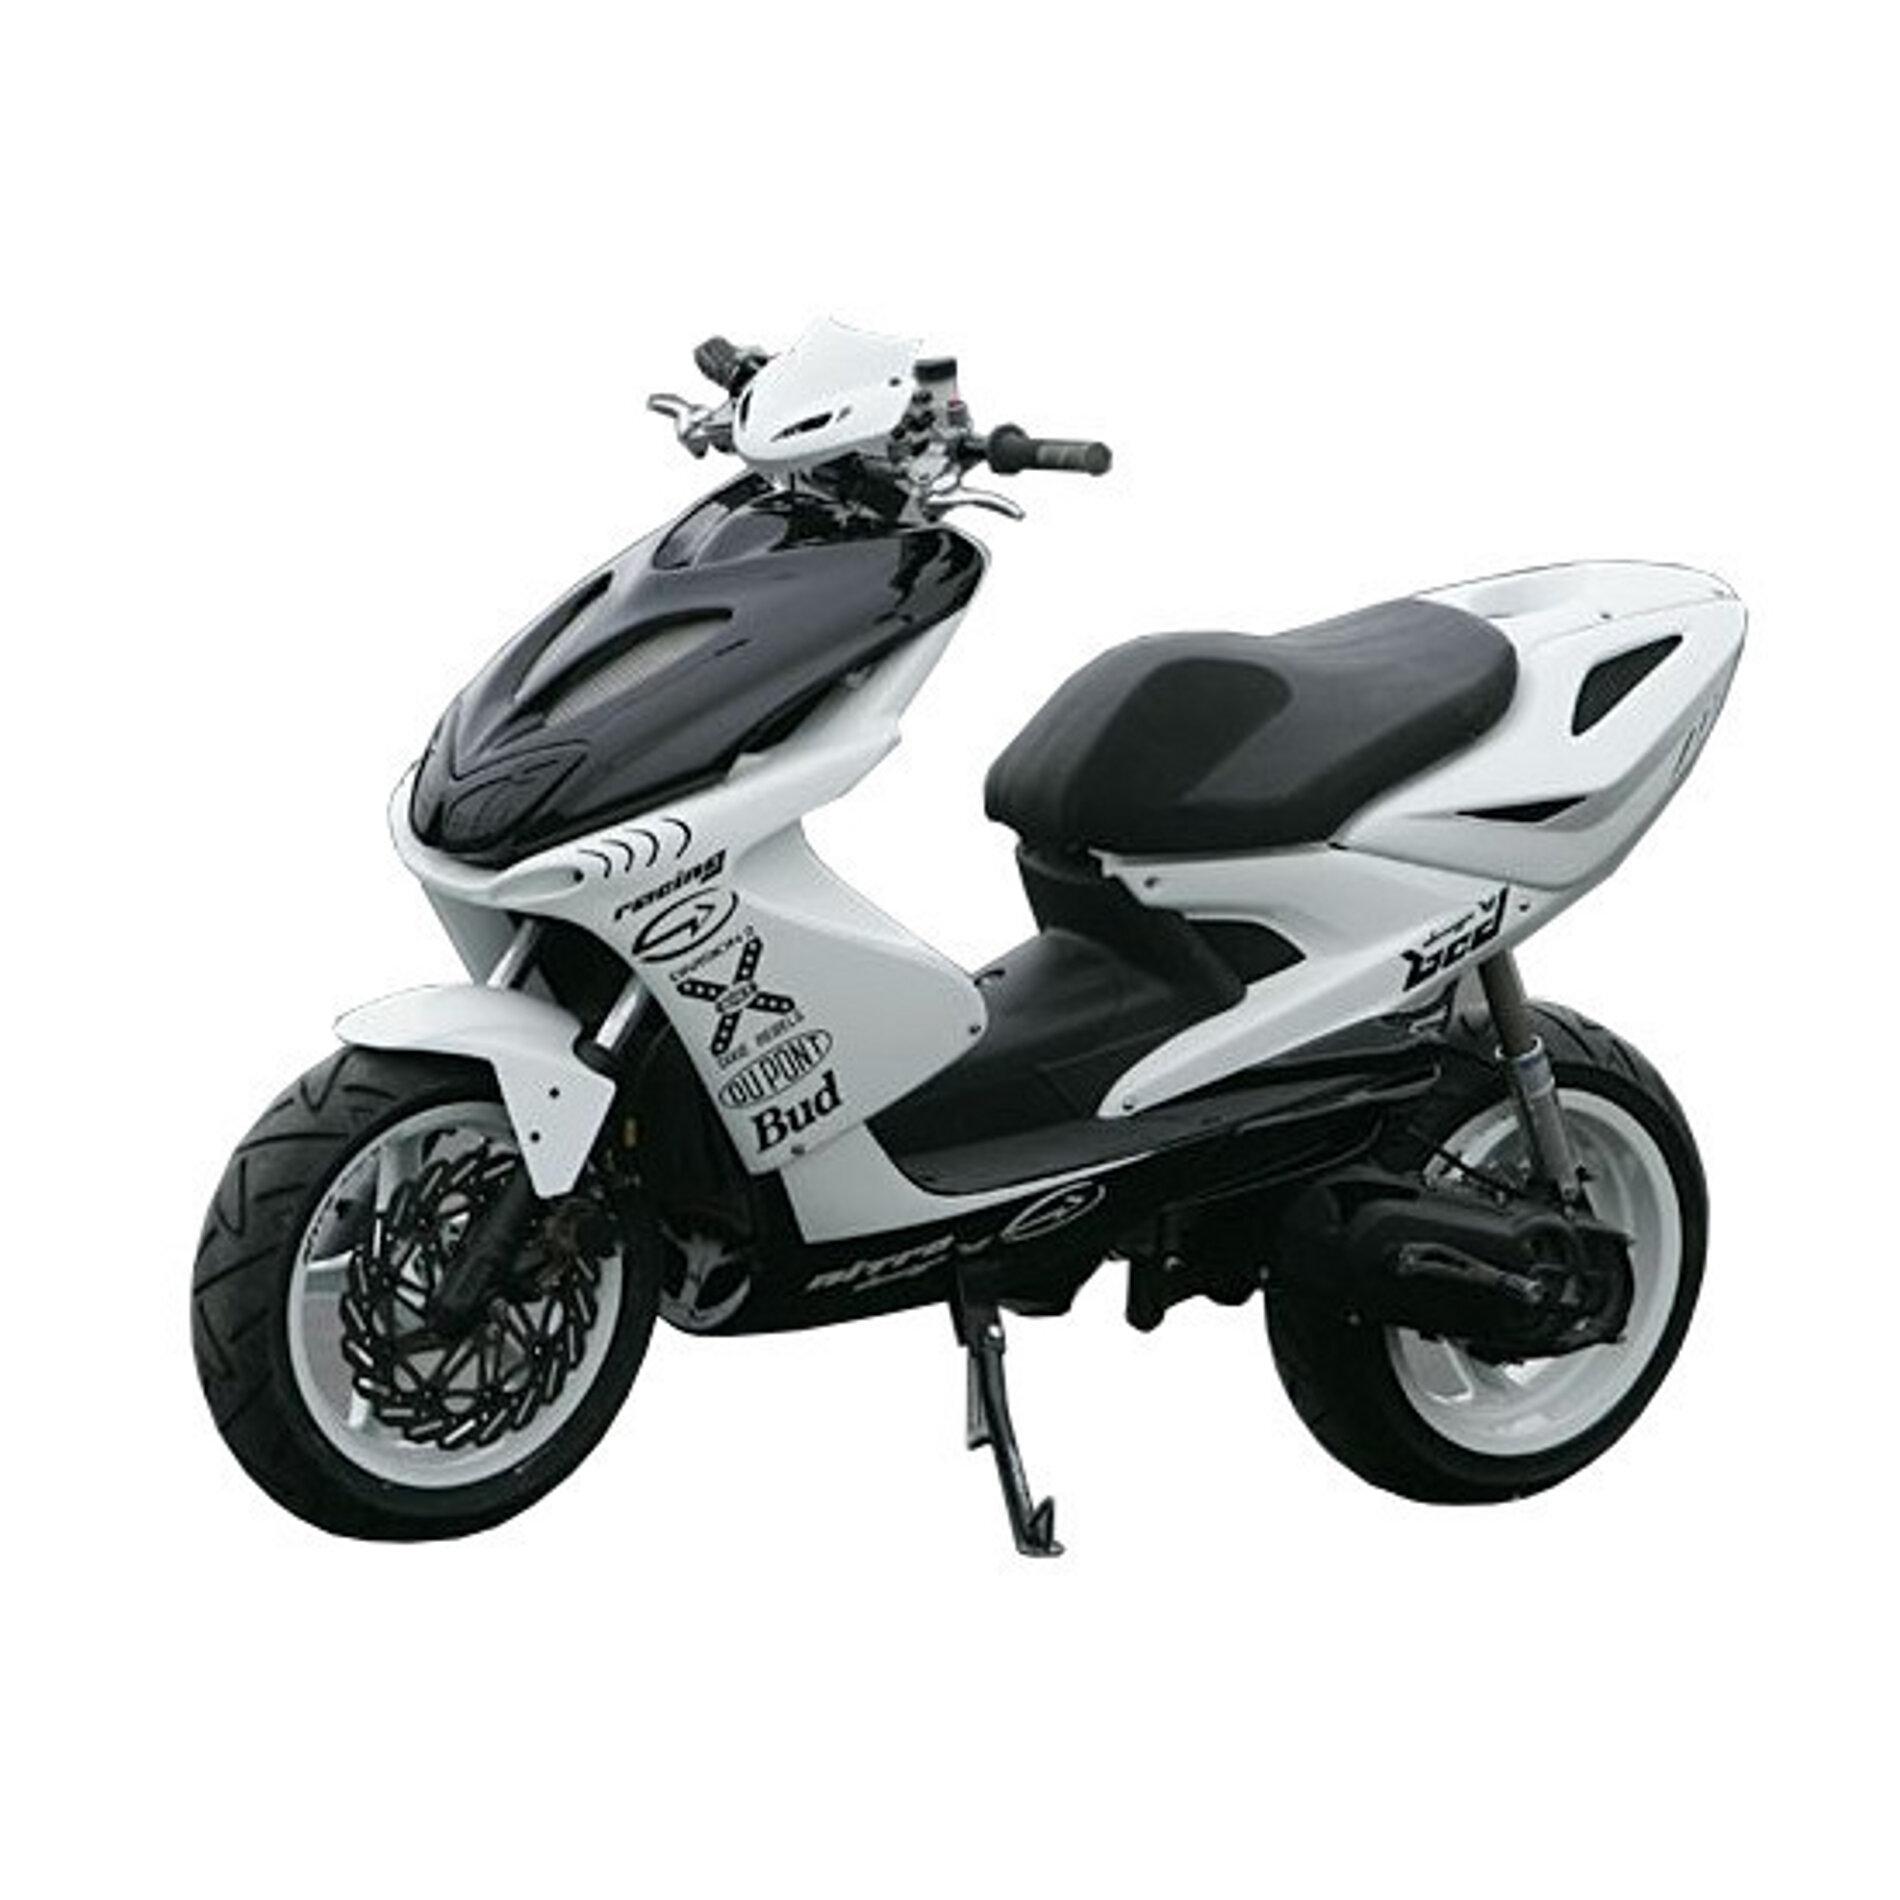 Kit habillage BCD MBK Nitro / Yamaha Aerox - Blanc